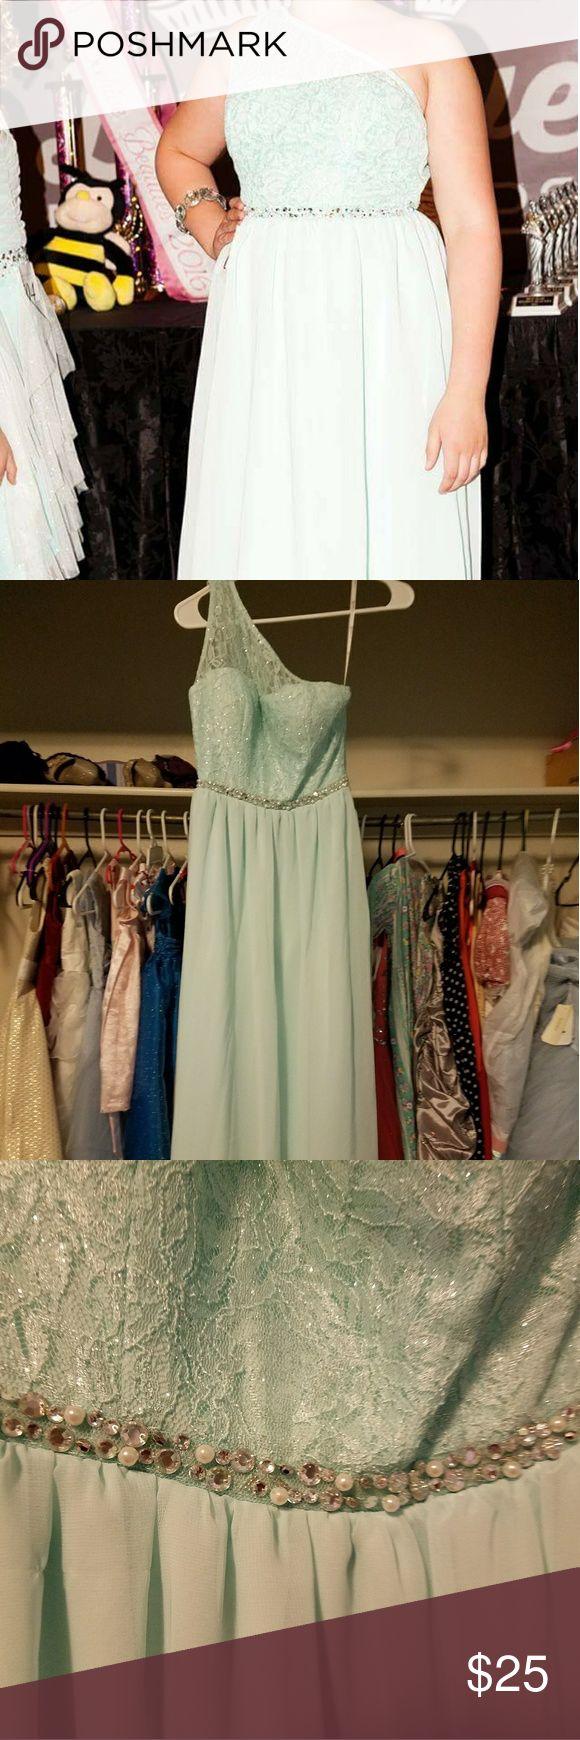 best cute dresses images on pinterest christening dresses